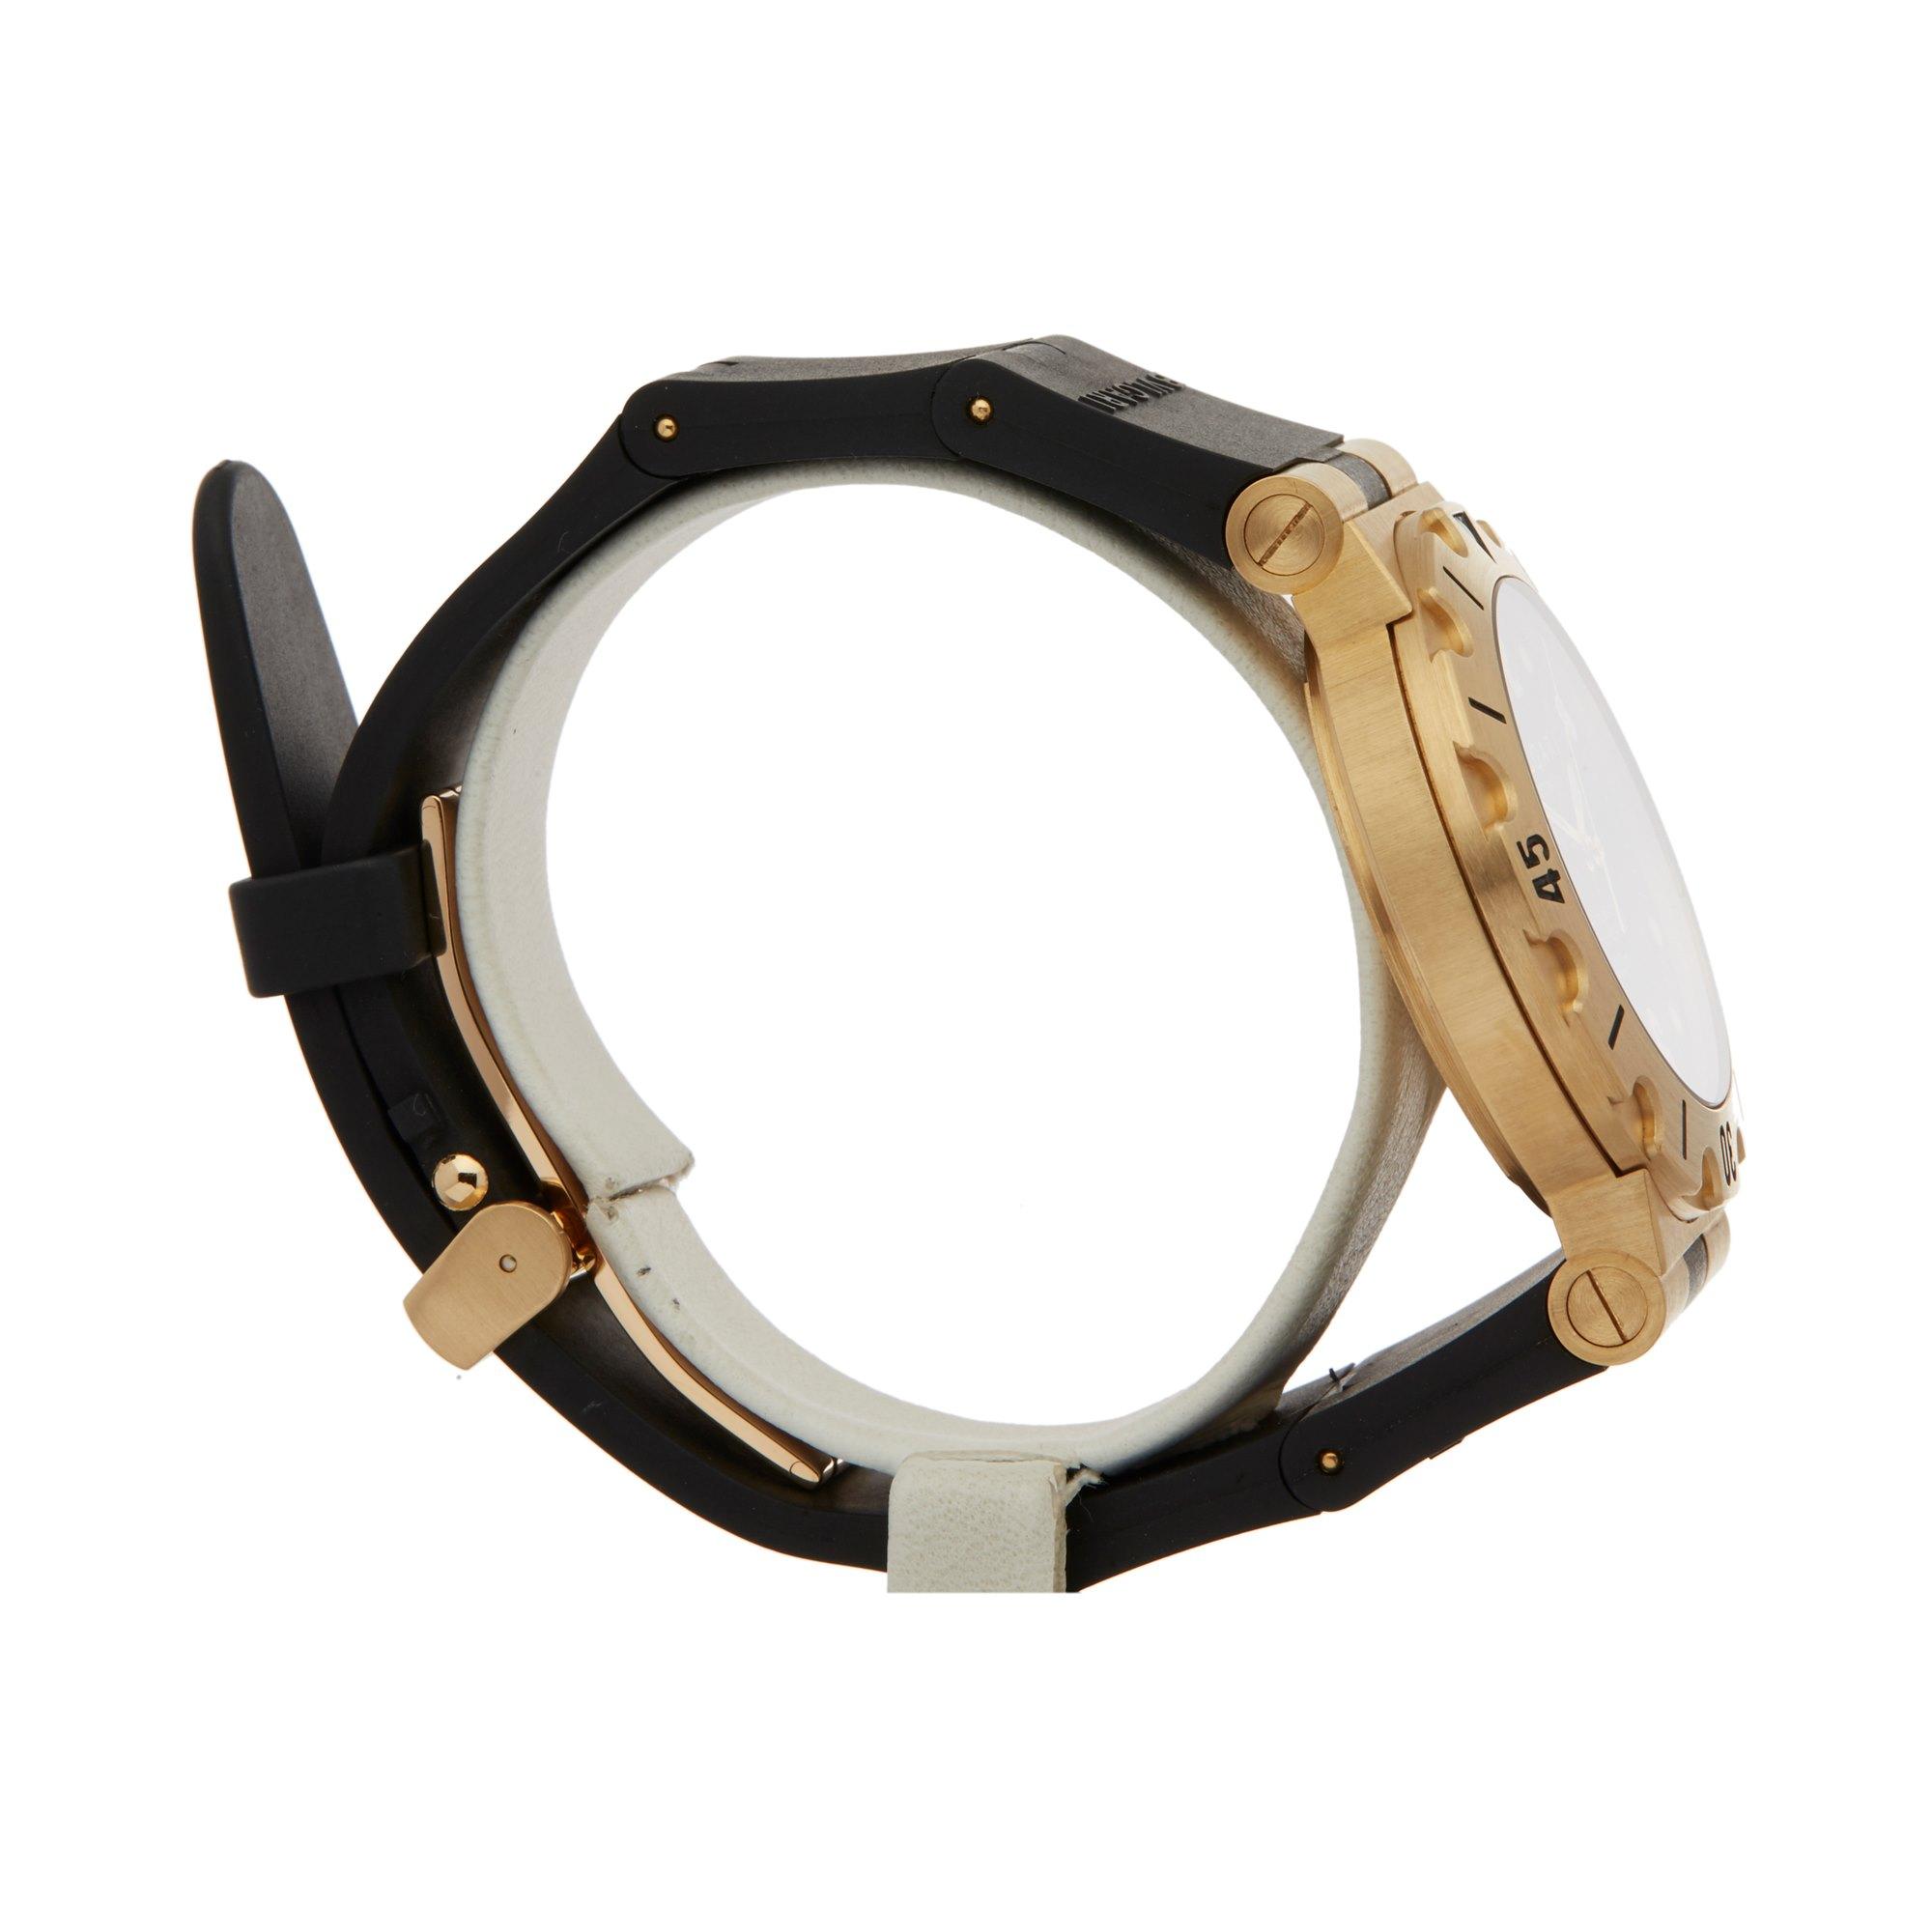 Lot 13 - Bulgari Diagono SD 38 G Unisex Yellow Gold Watch